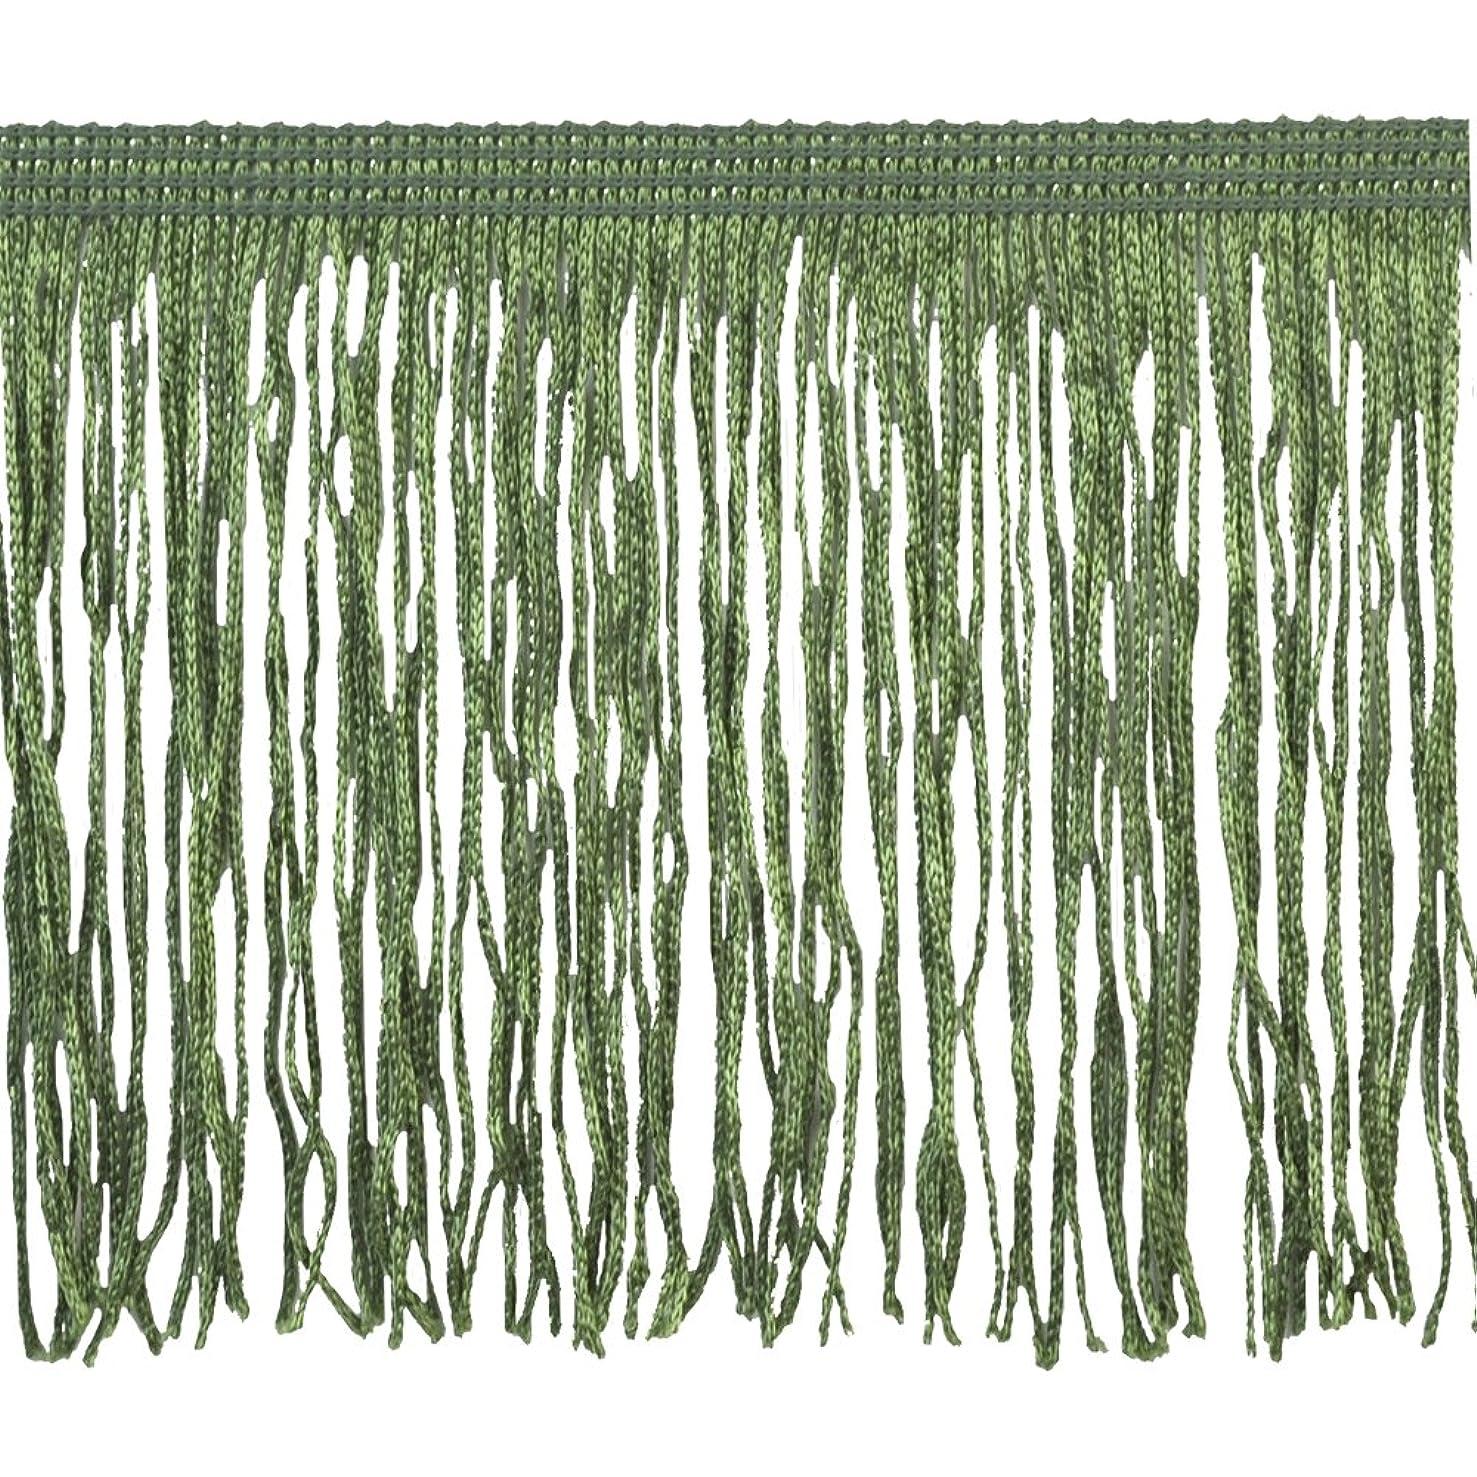 Chainette Fringe P-7044 100-Percent Polyester 4-Inch Fringe Embellishment, 10-Yard, 25 Jungle